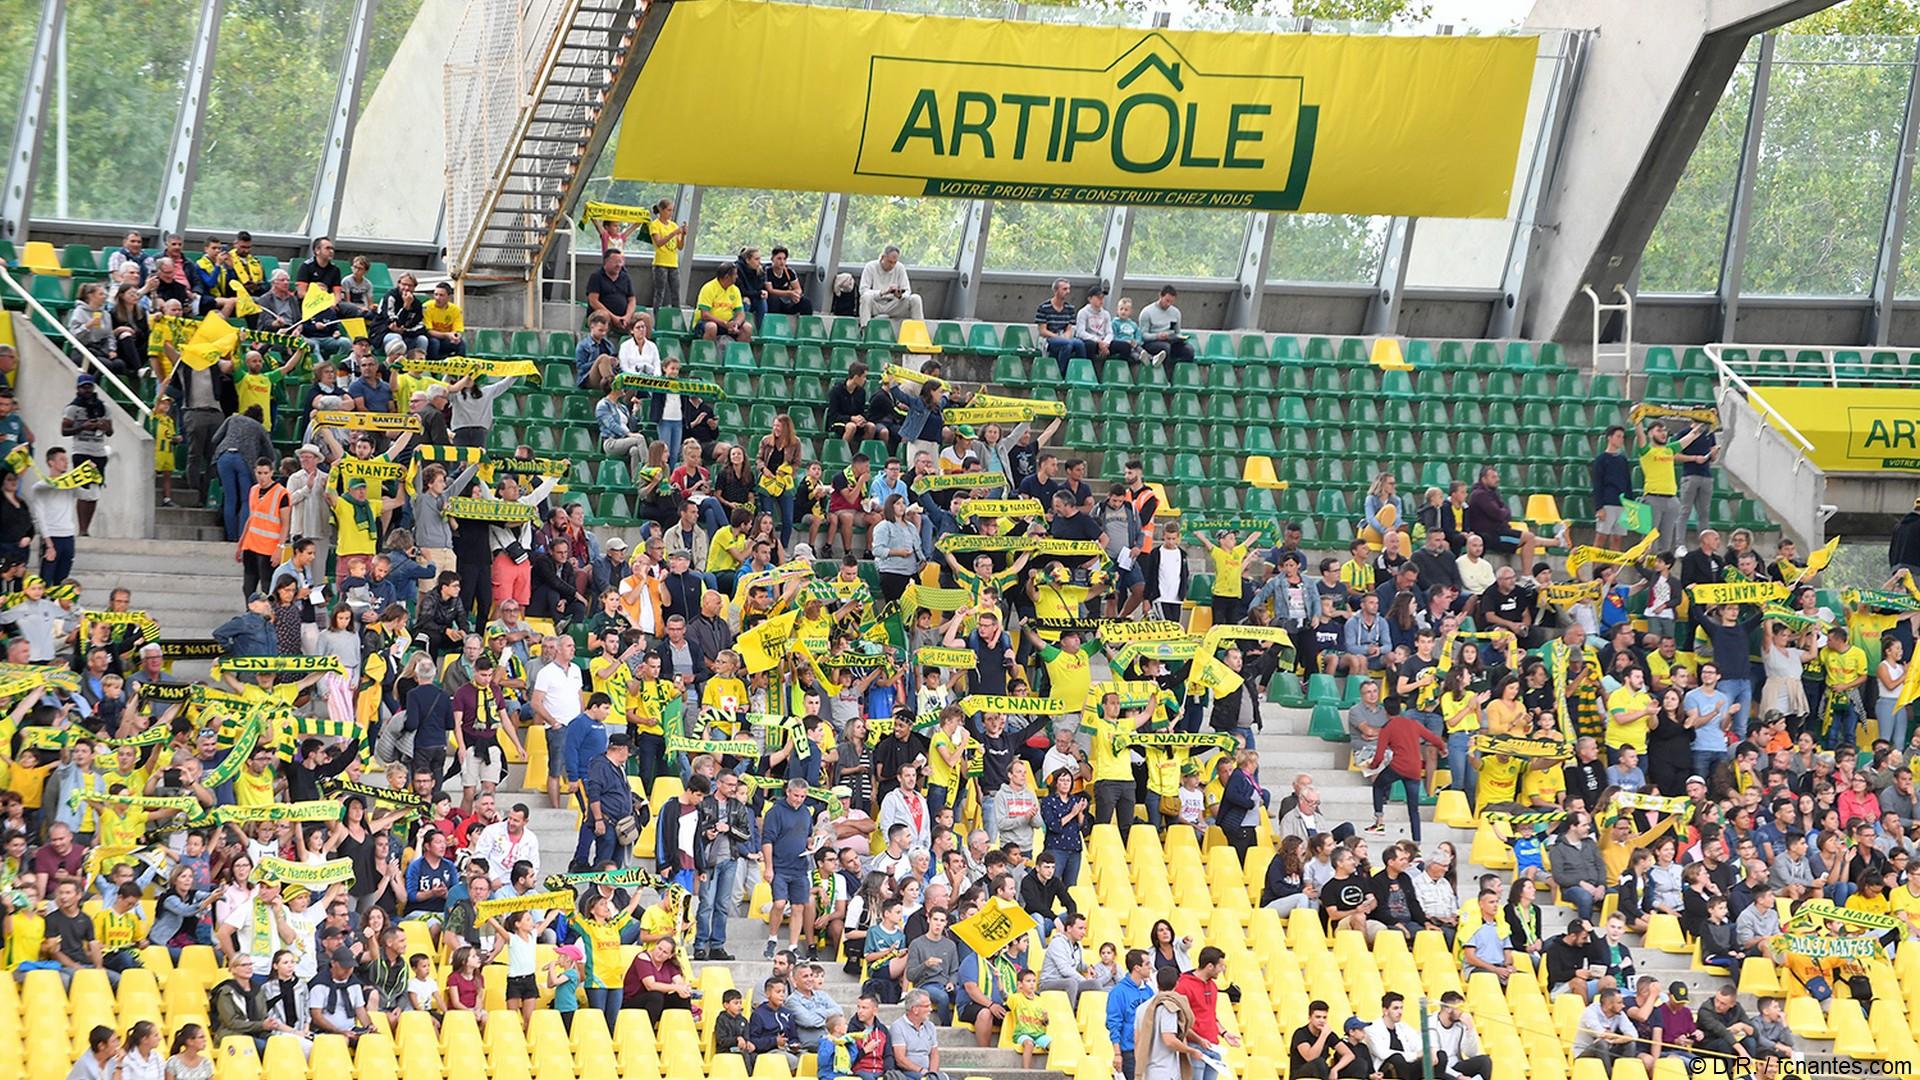 Artipole x FC Nantes (football) 2020